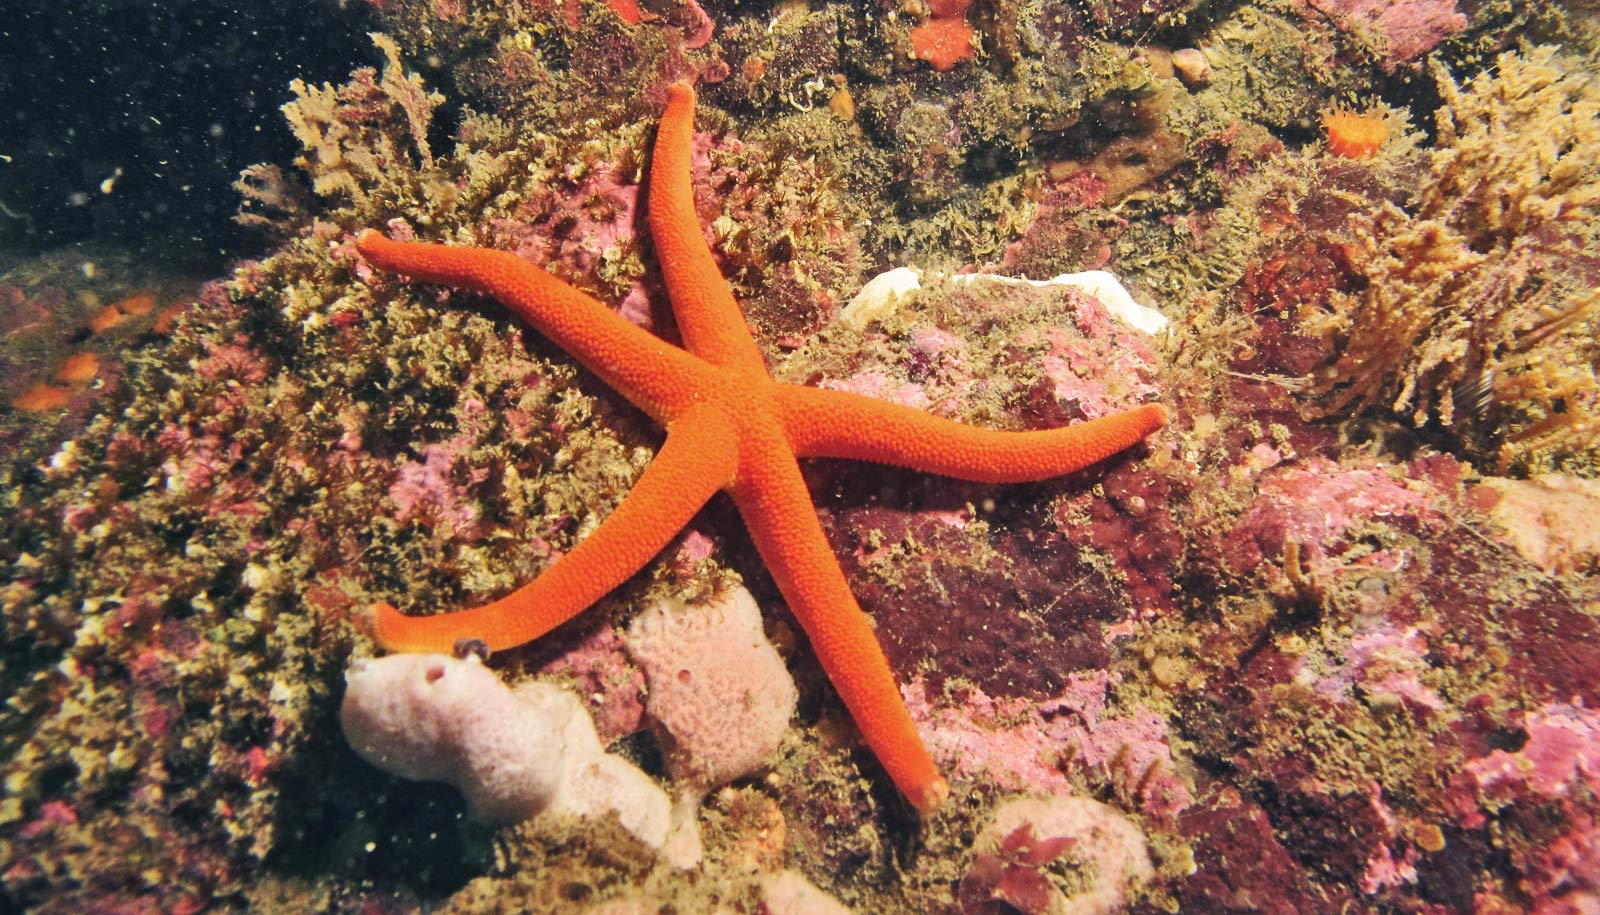 healthy sea star